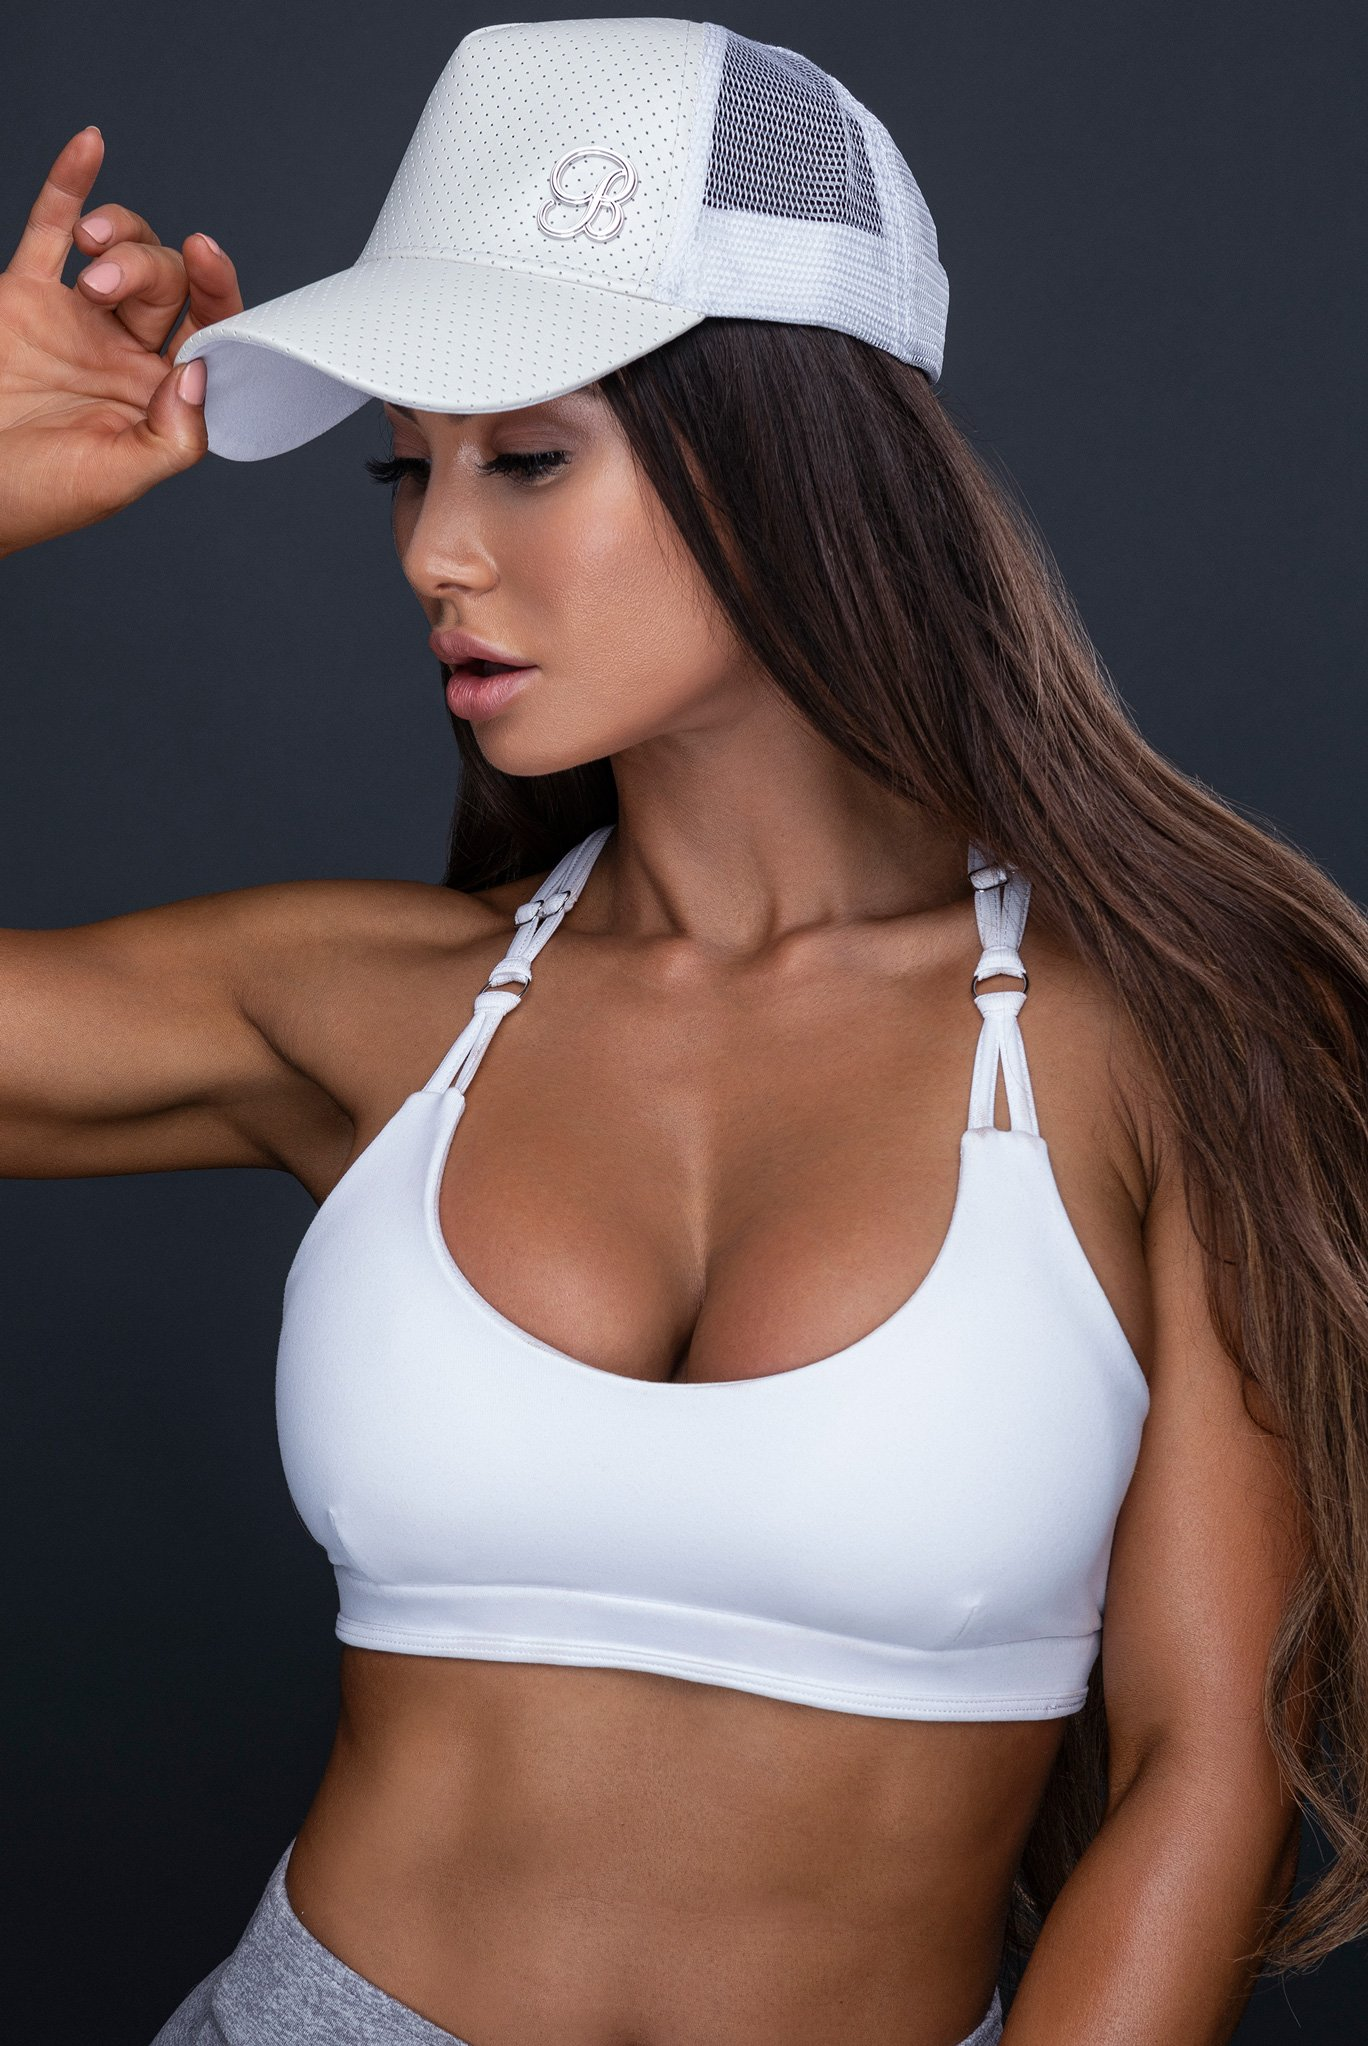 White Trucker Hats